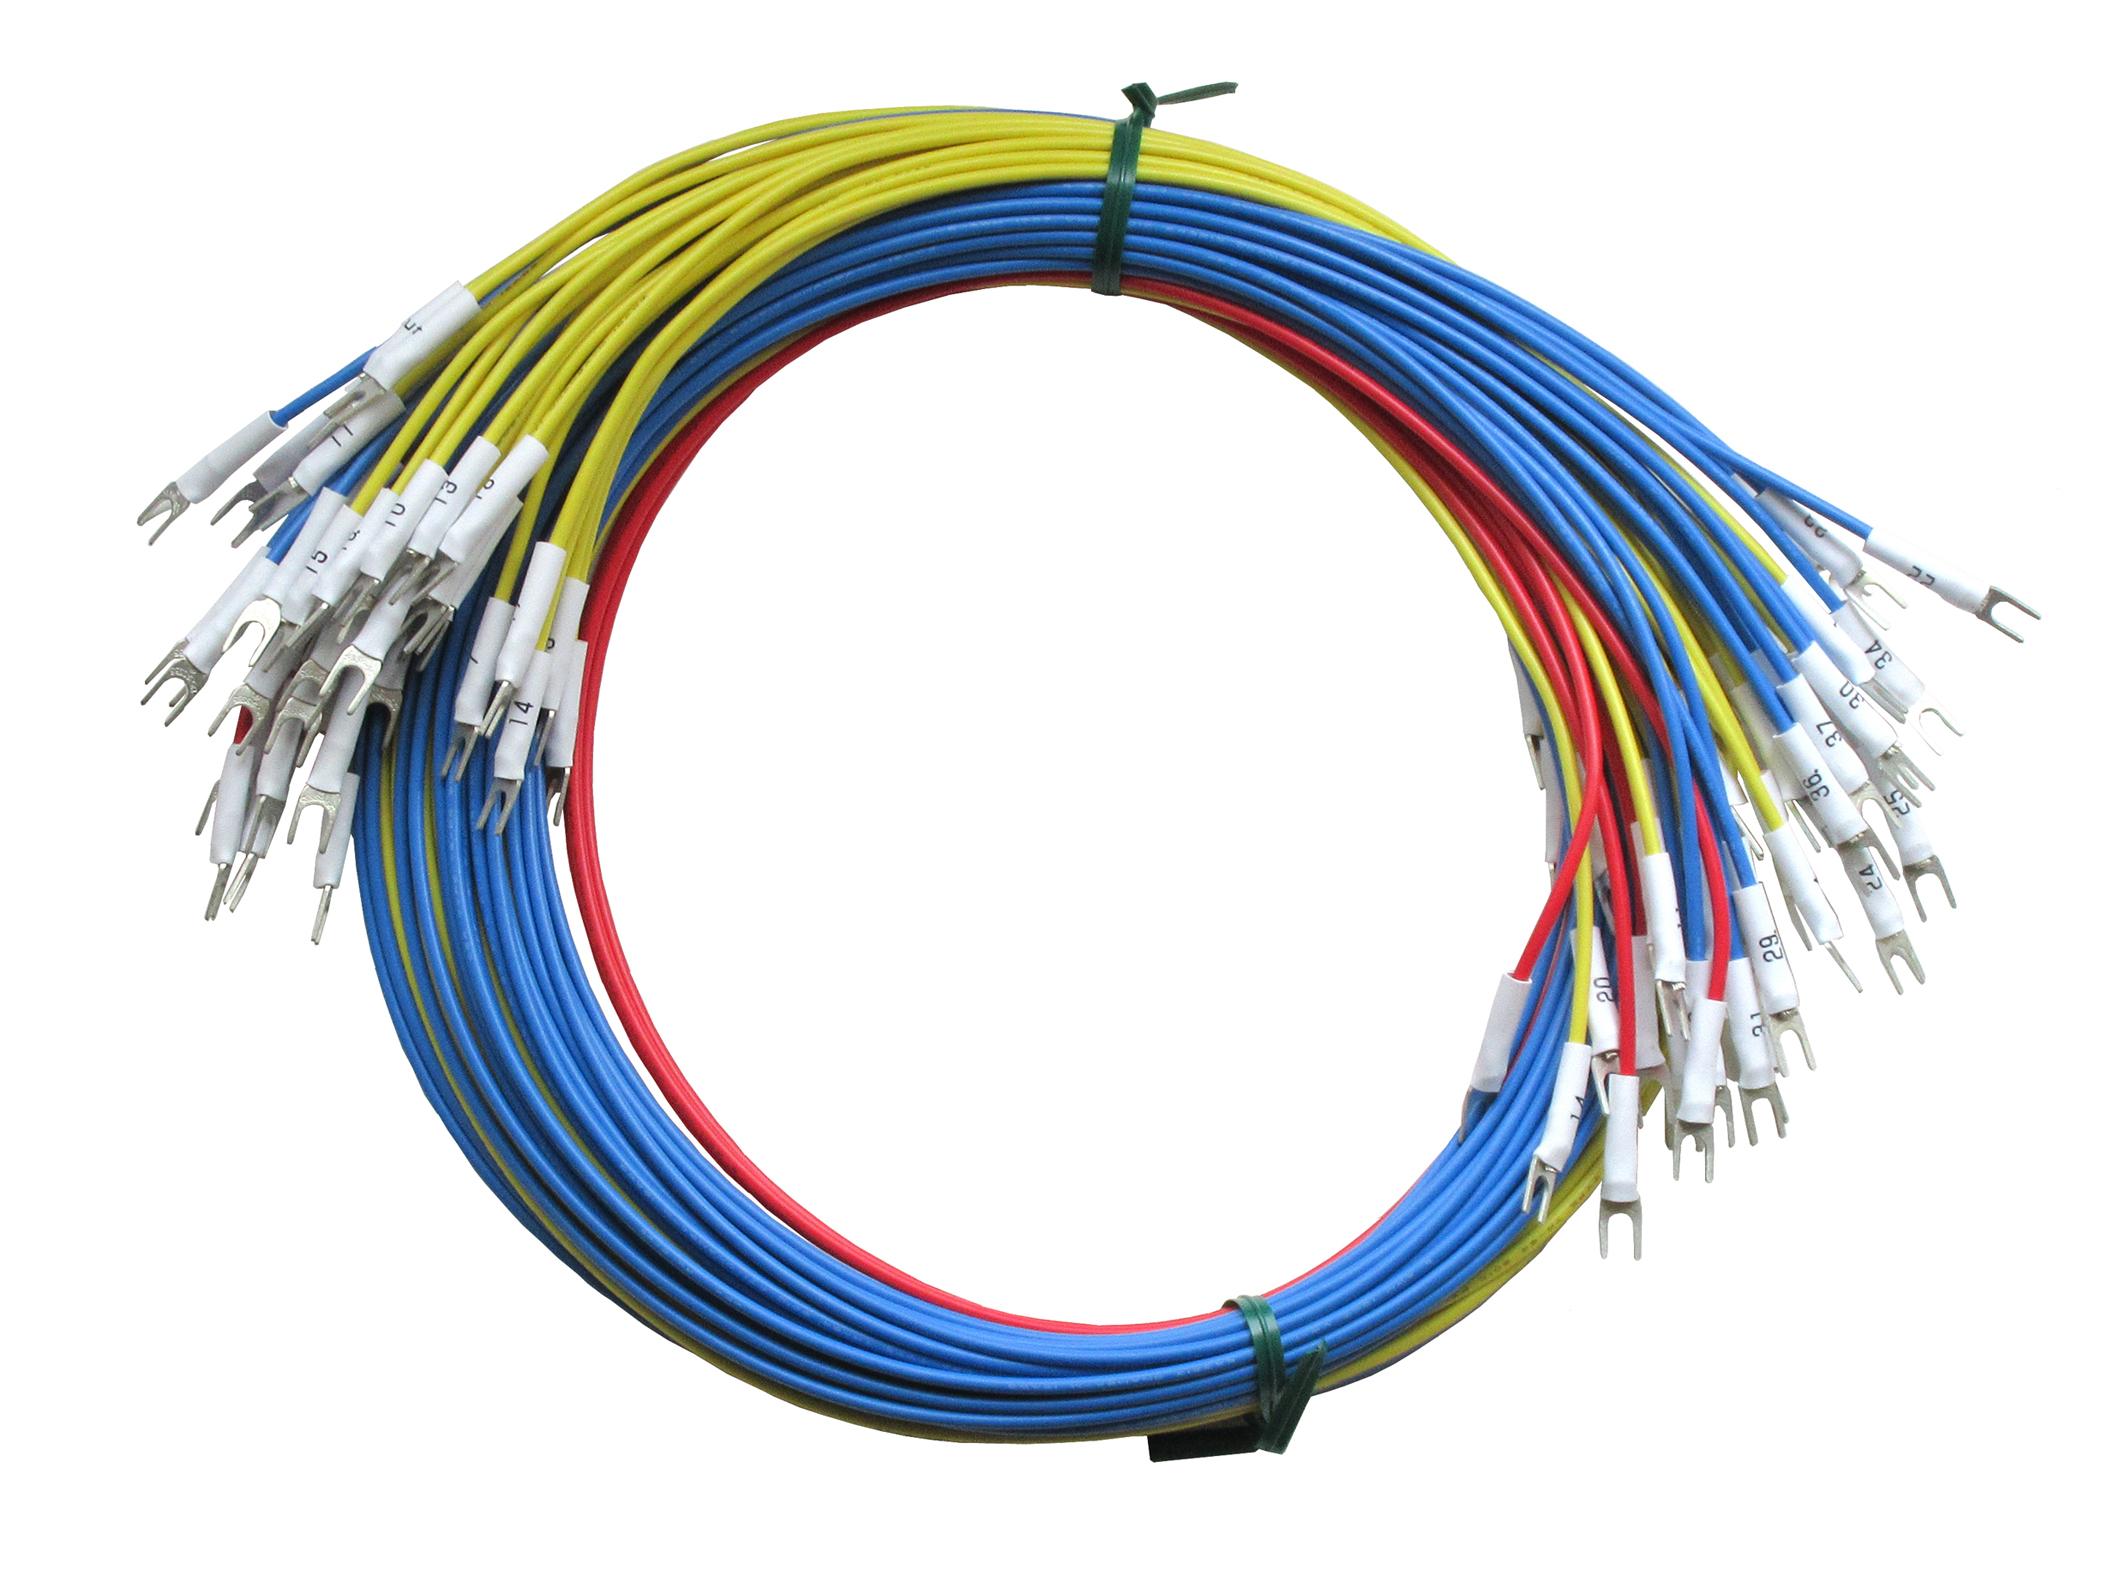 Y端子付き配線ケーブル